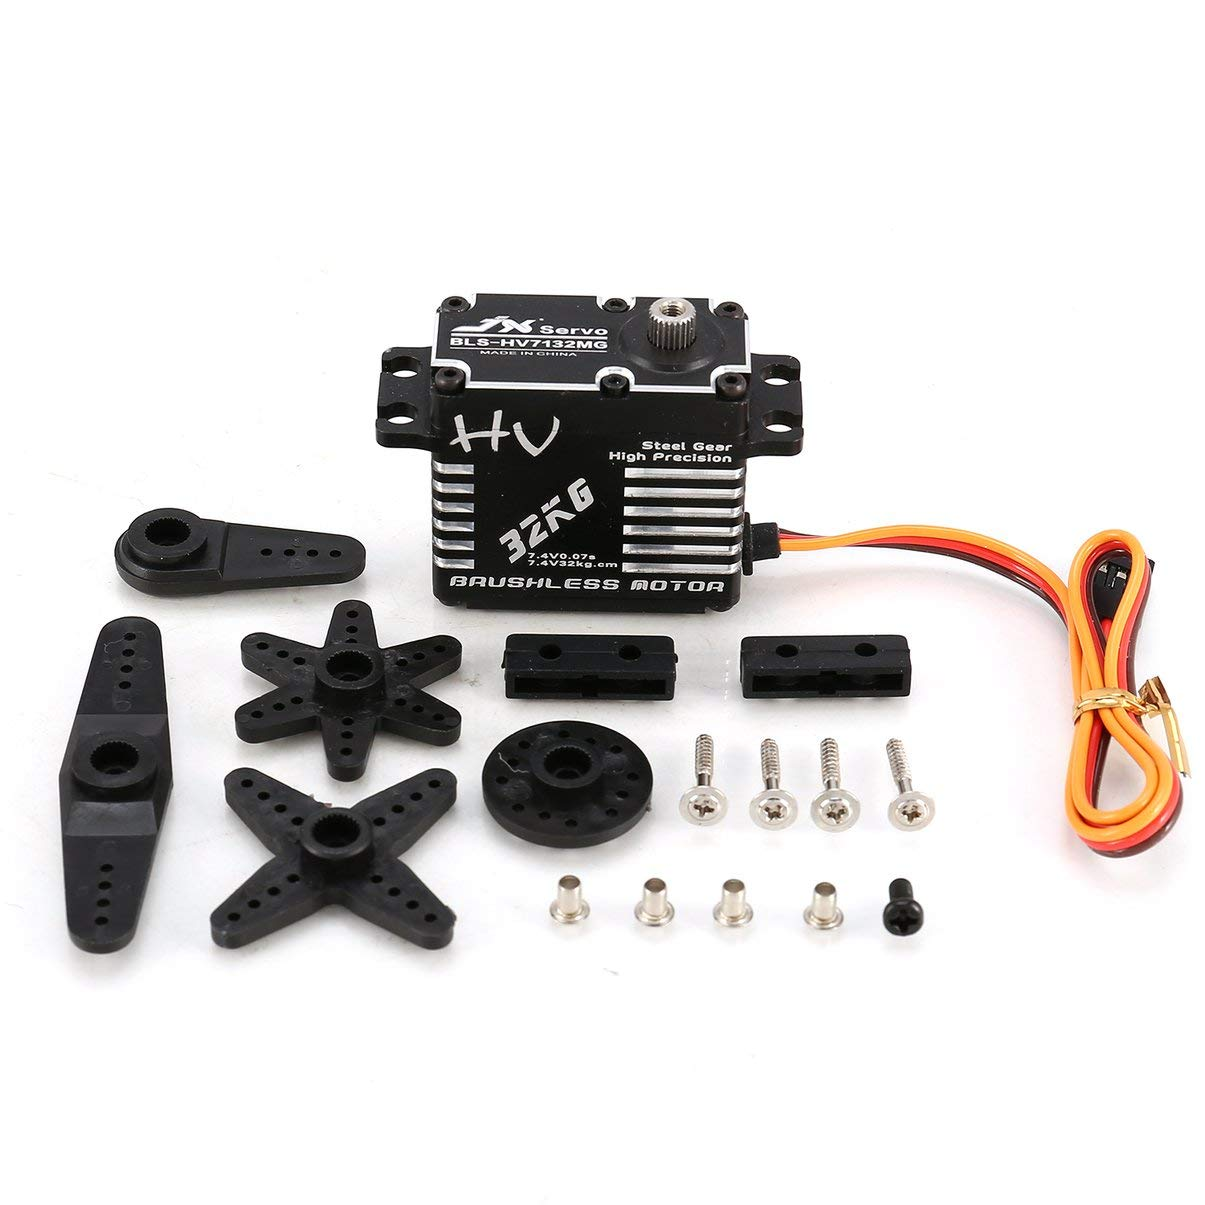 JullyeleDEgant JX BLS-HV7132MG 32 32 32 KG Metalllenkung Digital Gear HV Brushless Servo mit Hochspannung für RC Car Robot Flugzeug Drohne c00165